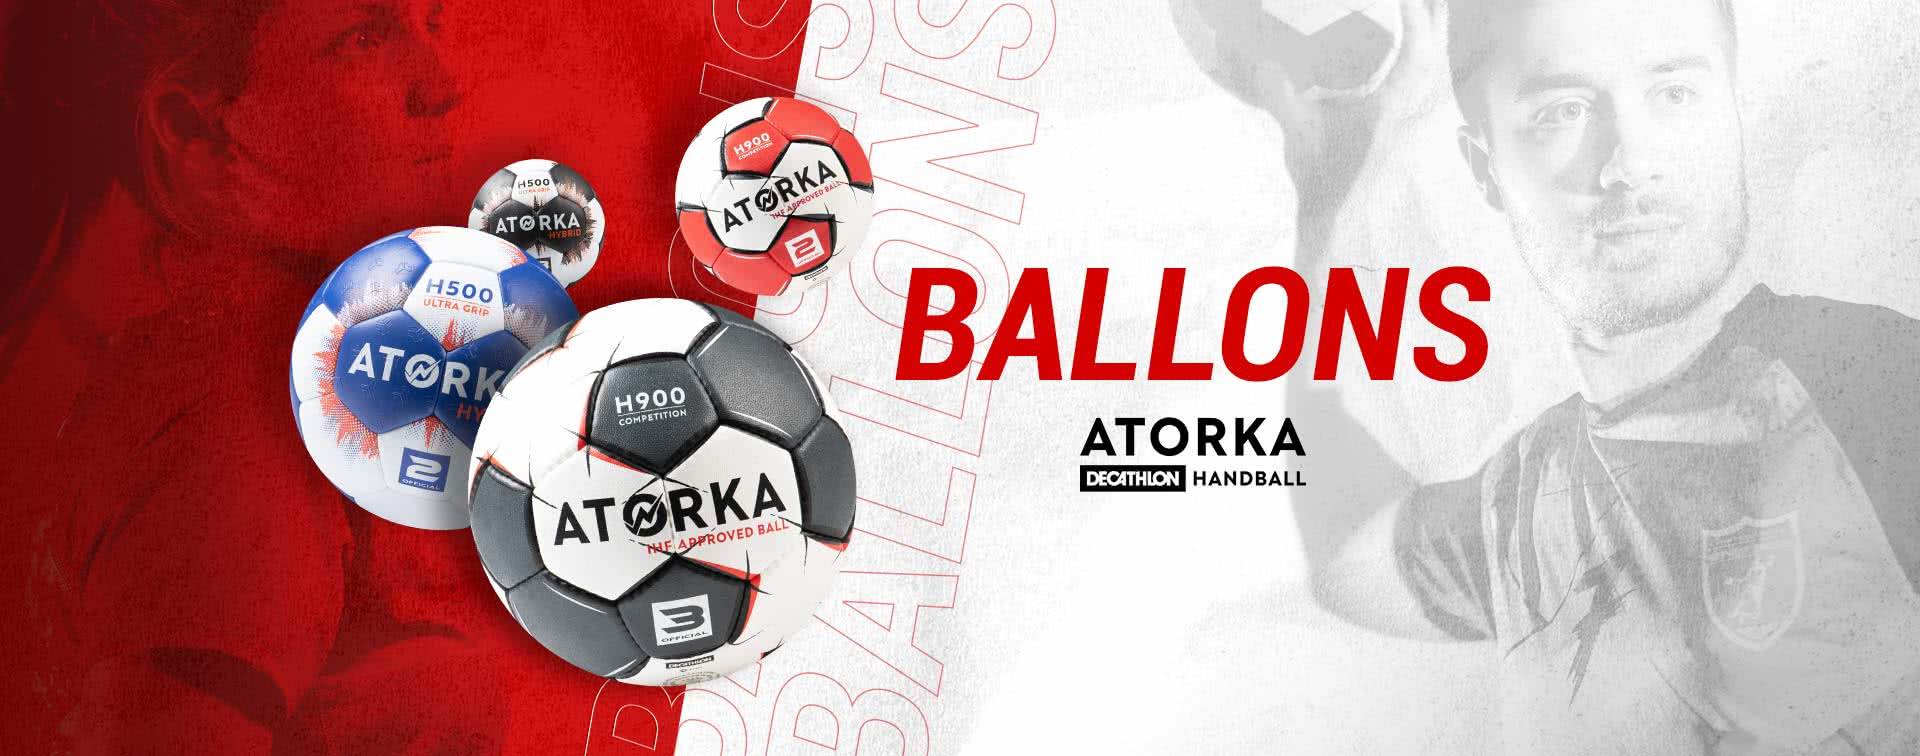 ballons Atorka